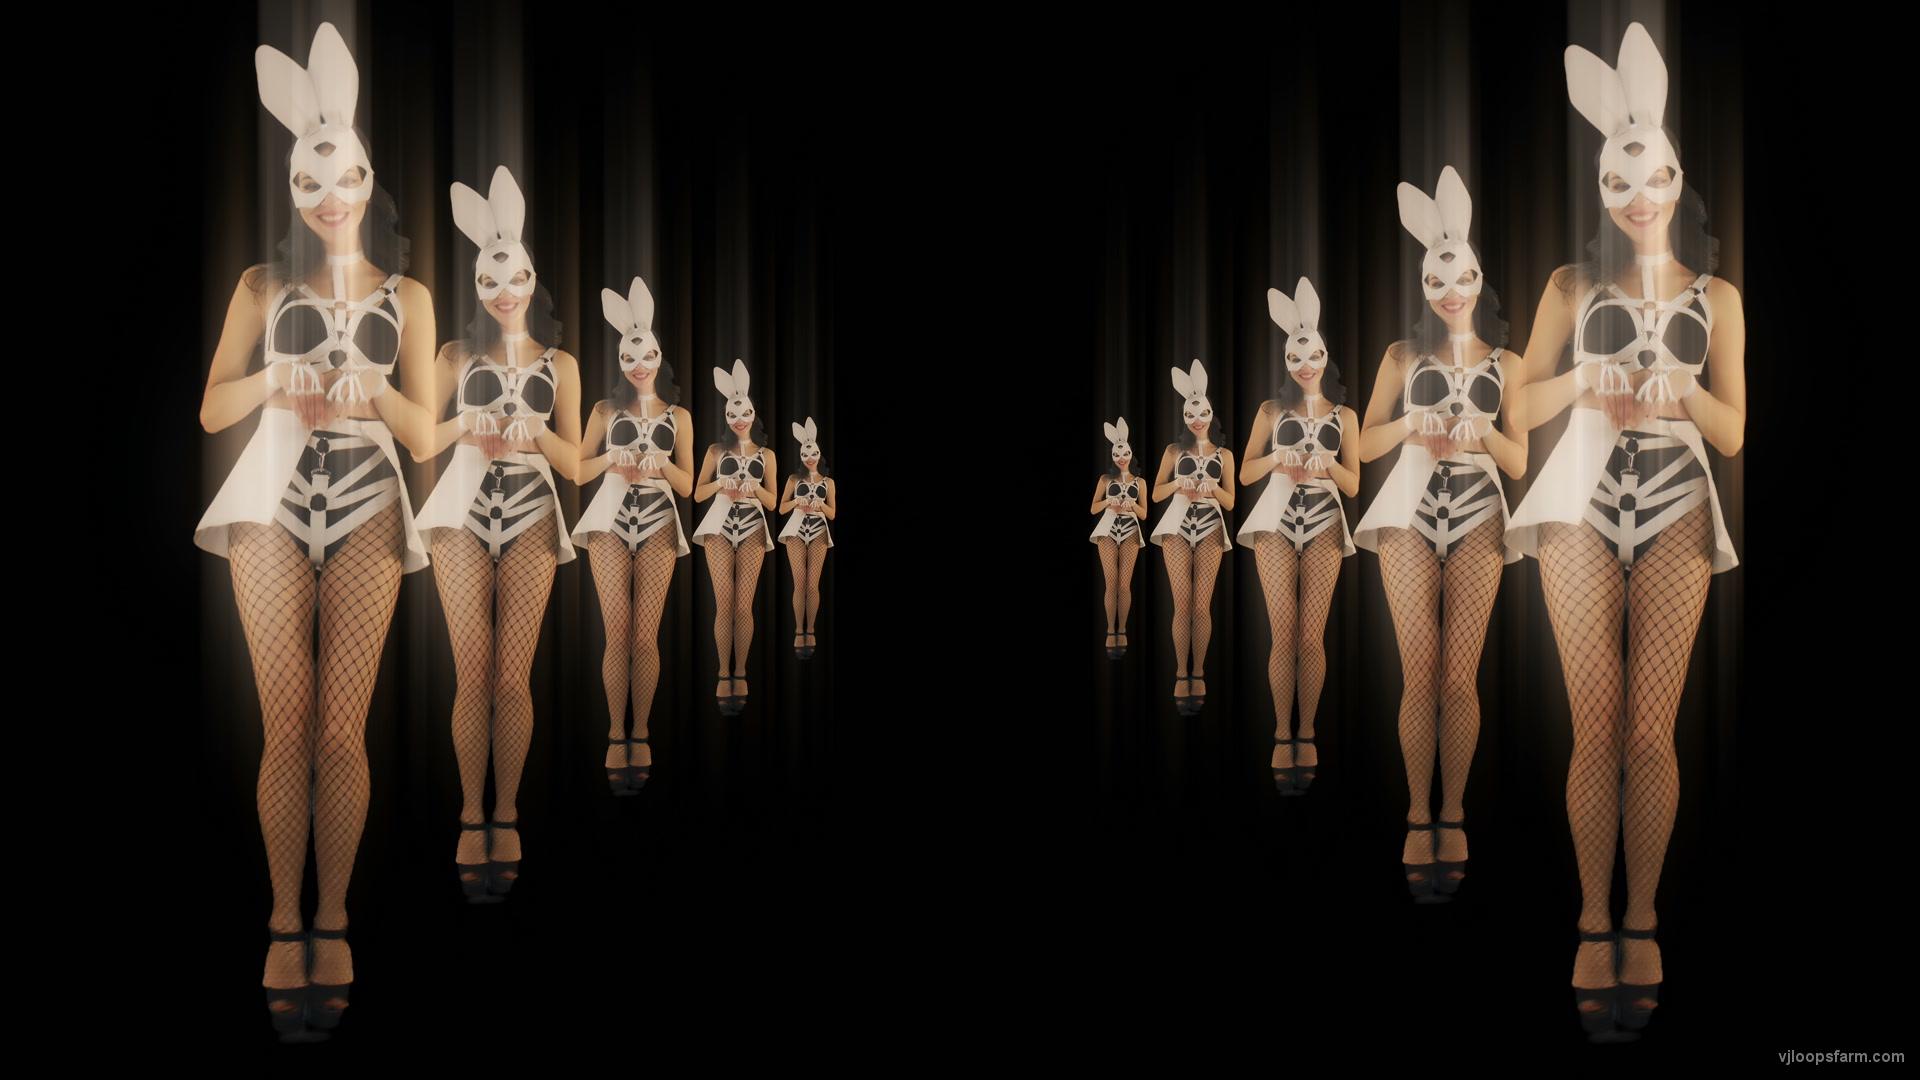 vj video background Happy-Jumping-tunnel-girls-in-rabbit-bunny-mask-4K-Video-Art-VJ-Loop_003